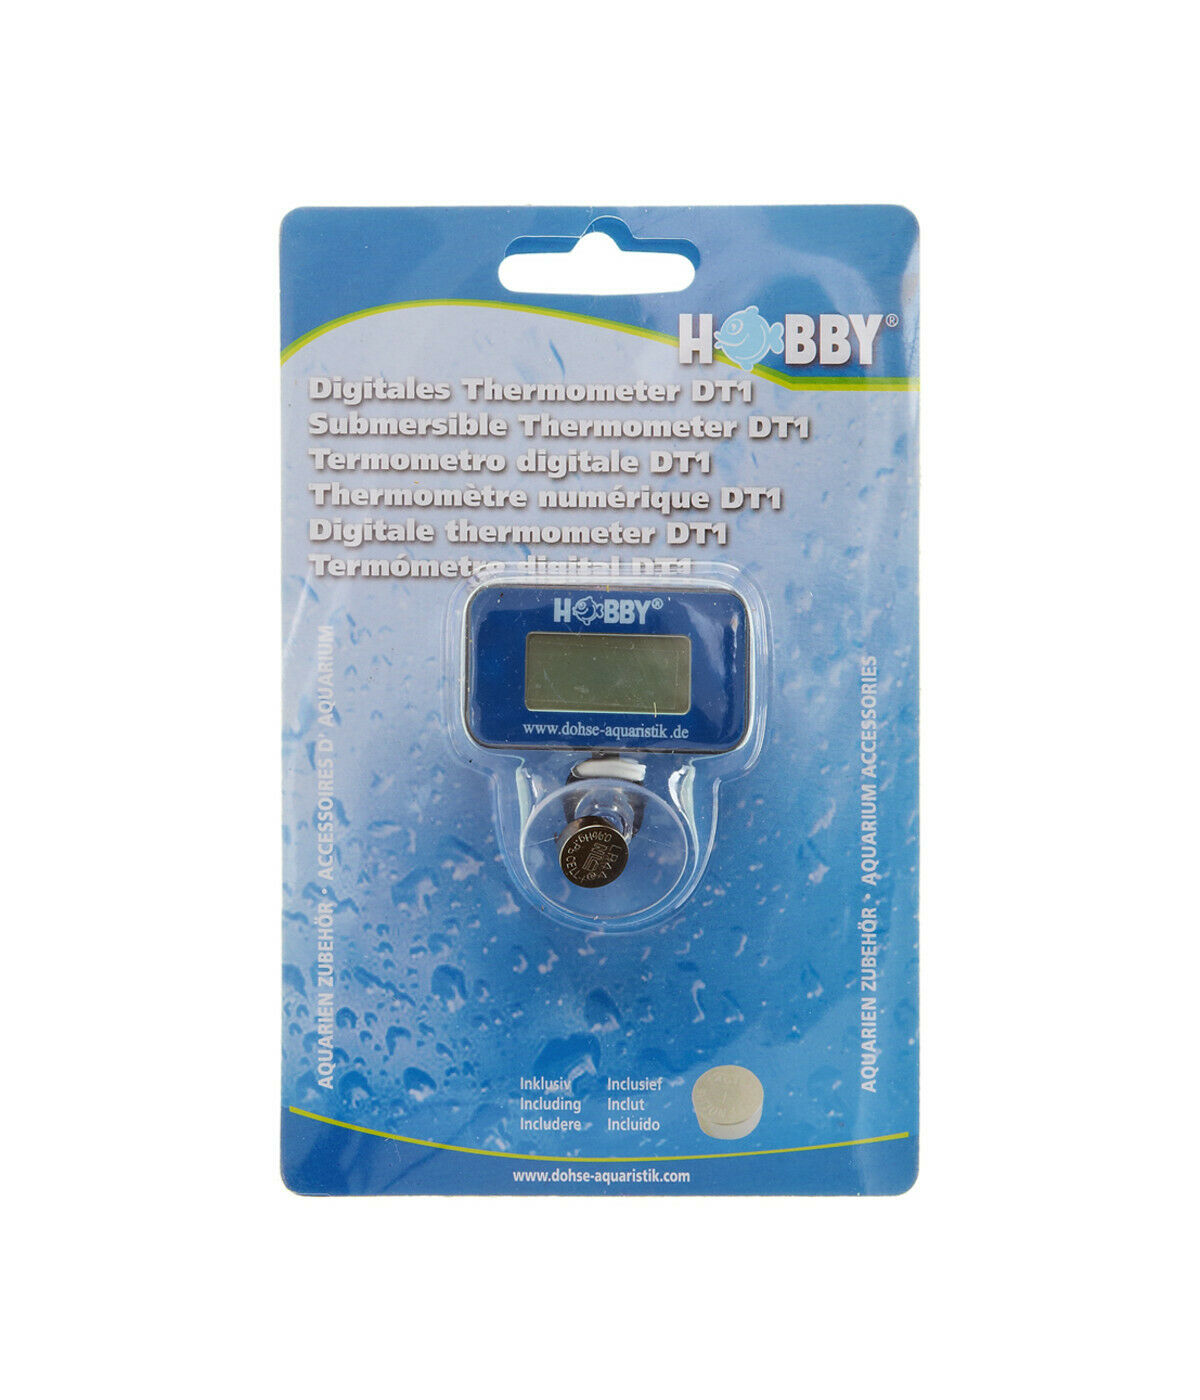 Hobby Digital Thermometer für Aquarium-Terrarium-Unterwasser 60495